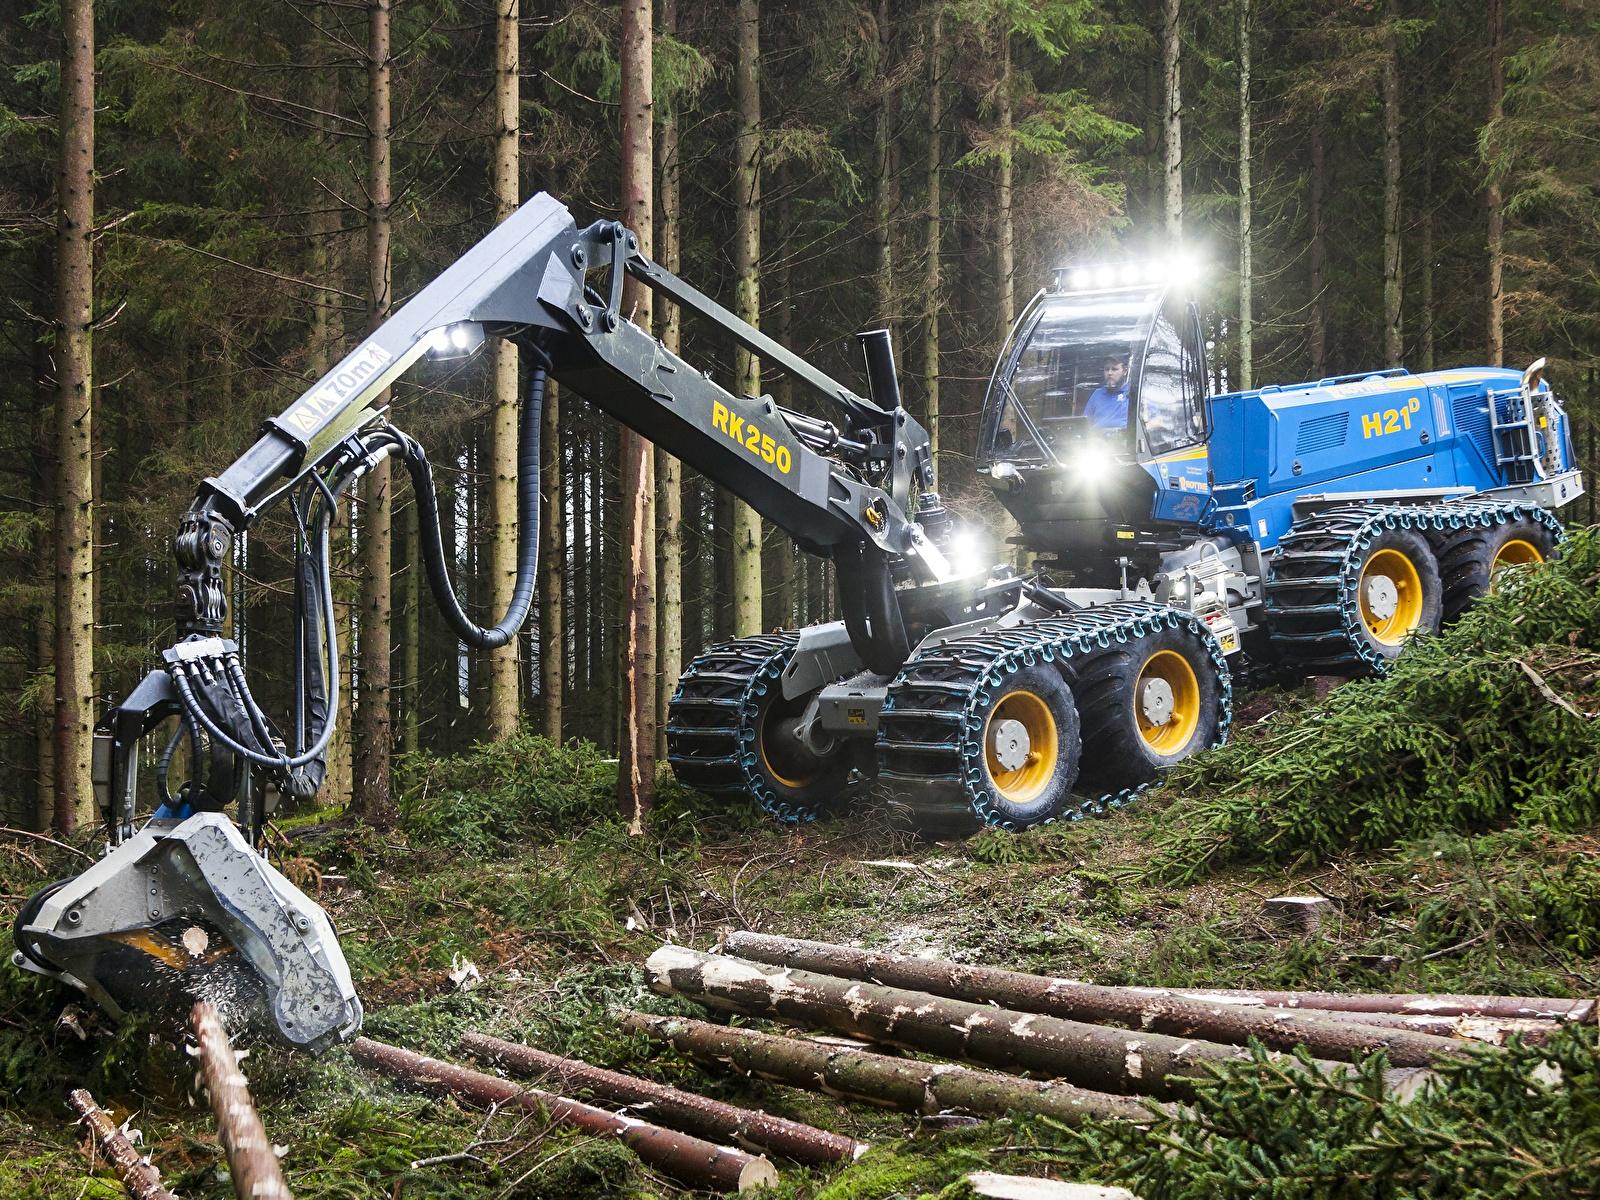 Обои для рабочего стола Форвардер 2013-18 Rottne H21D Бревна лес 1600x1200 бревно Леса